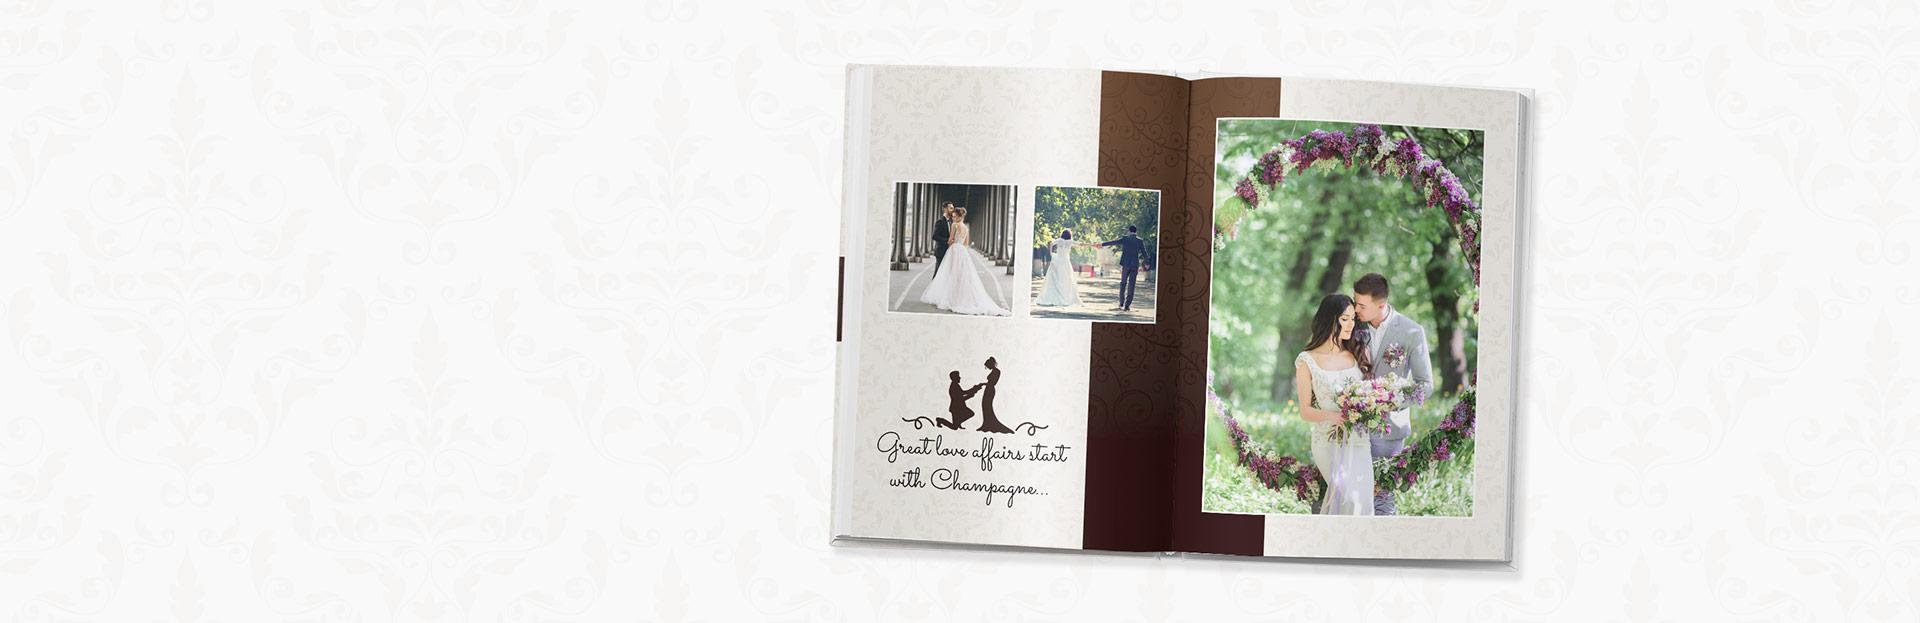 Online Photo Book